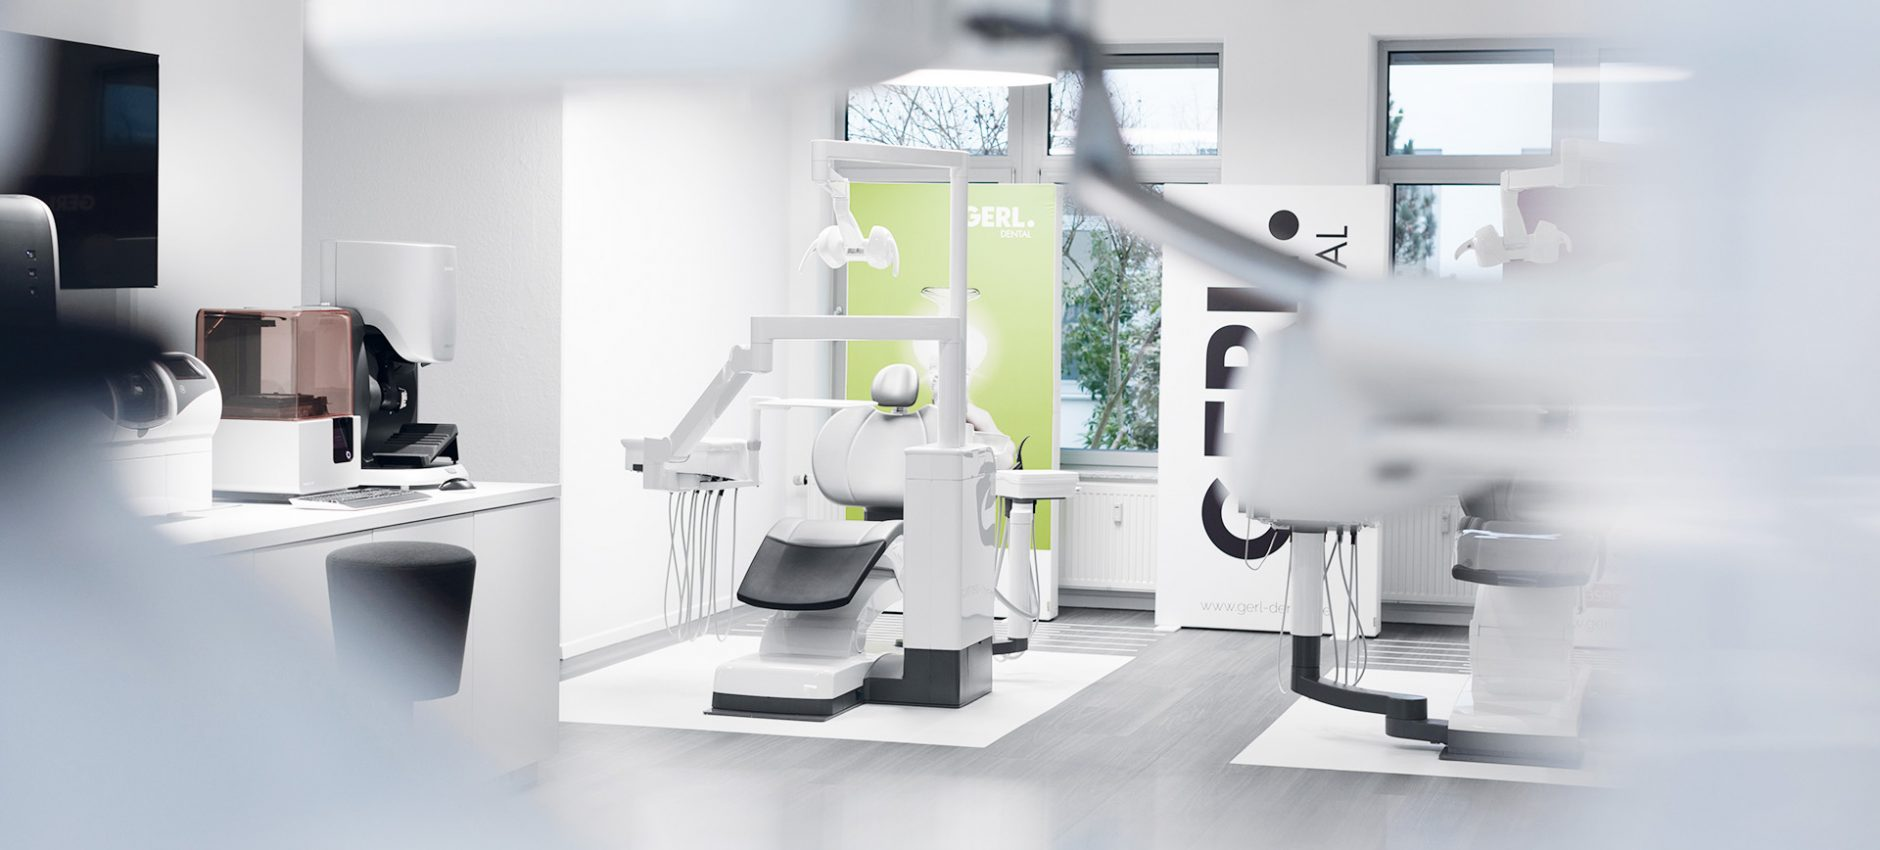 0019_GERL_DentalShowroom_Zaehne_1920x1000_72dpi.jpg